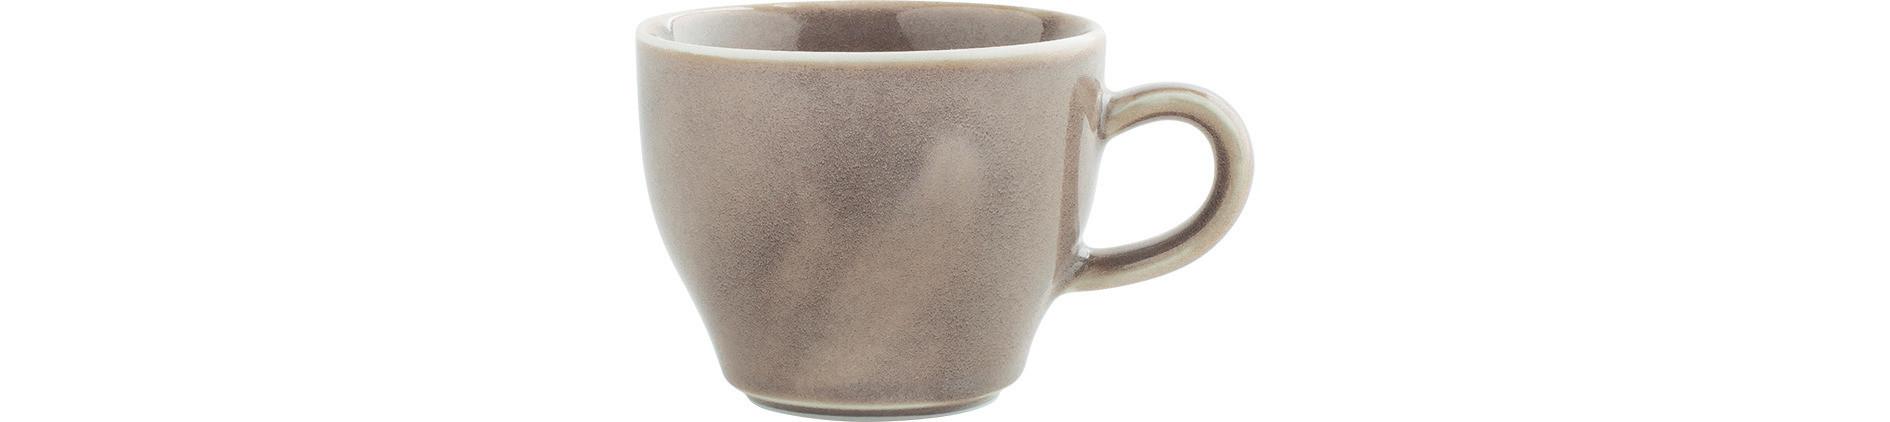 Homestyle, Cappuccinotasse Italiano ø 85 mm / 0,18 l desert sand